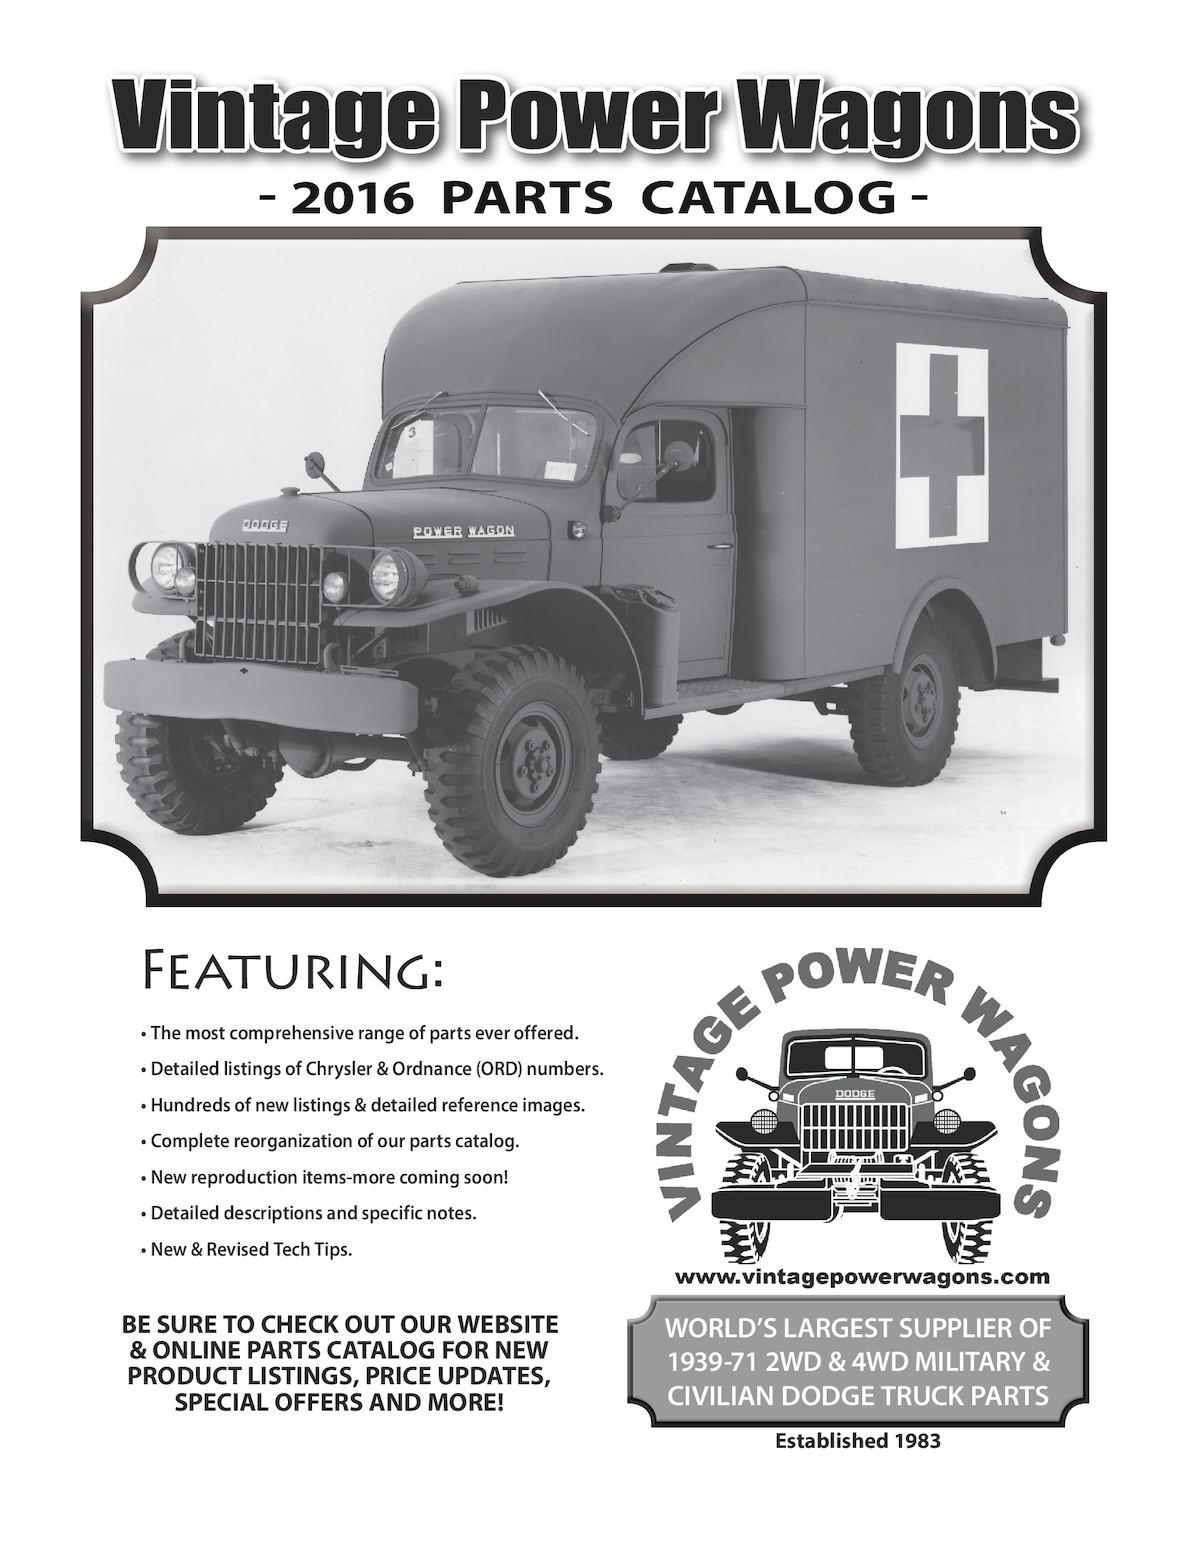 Calamo Complete 2016 Vintage Power Wagons Parts Catalog Club Car Carryall 272 Wiring Diagram